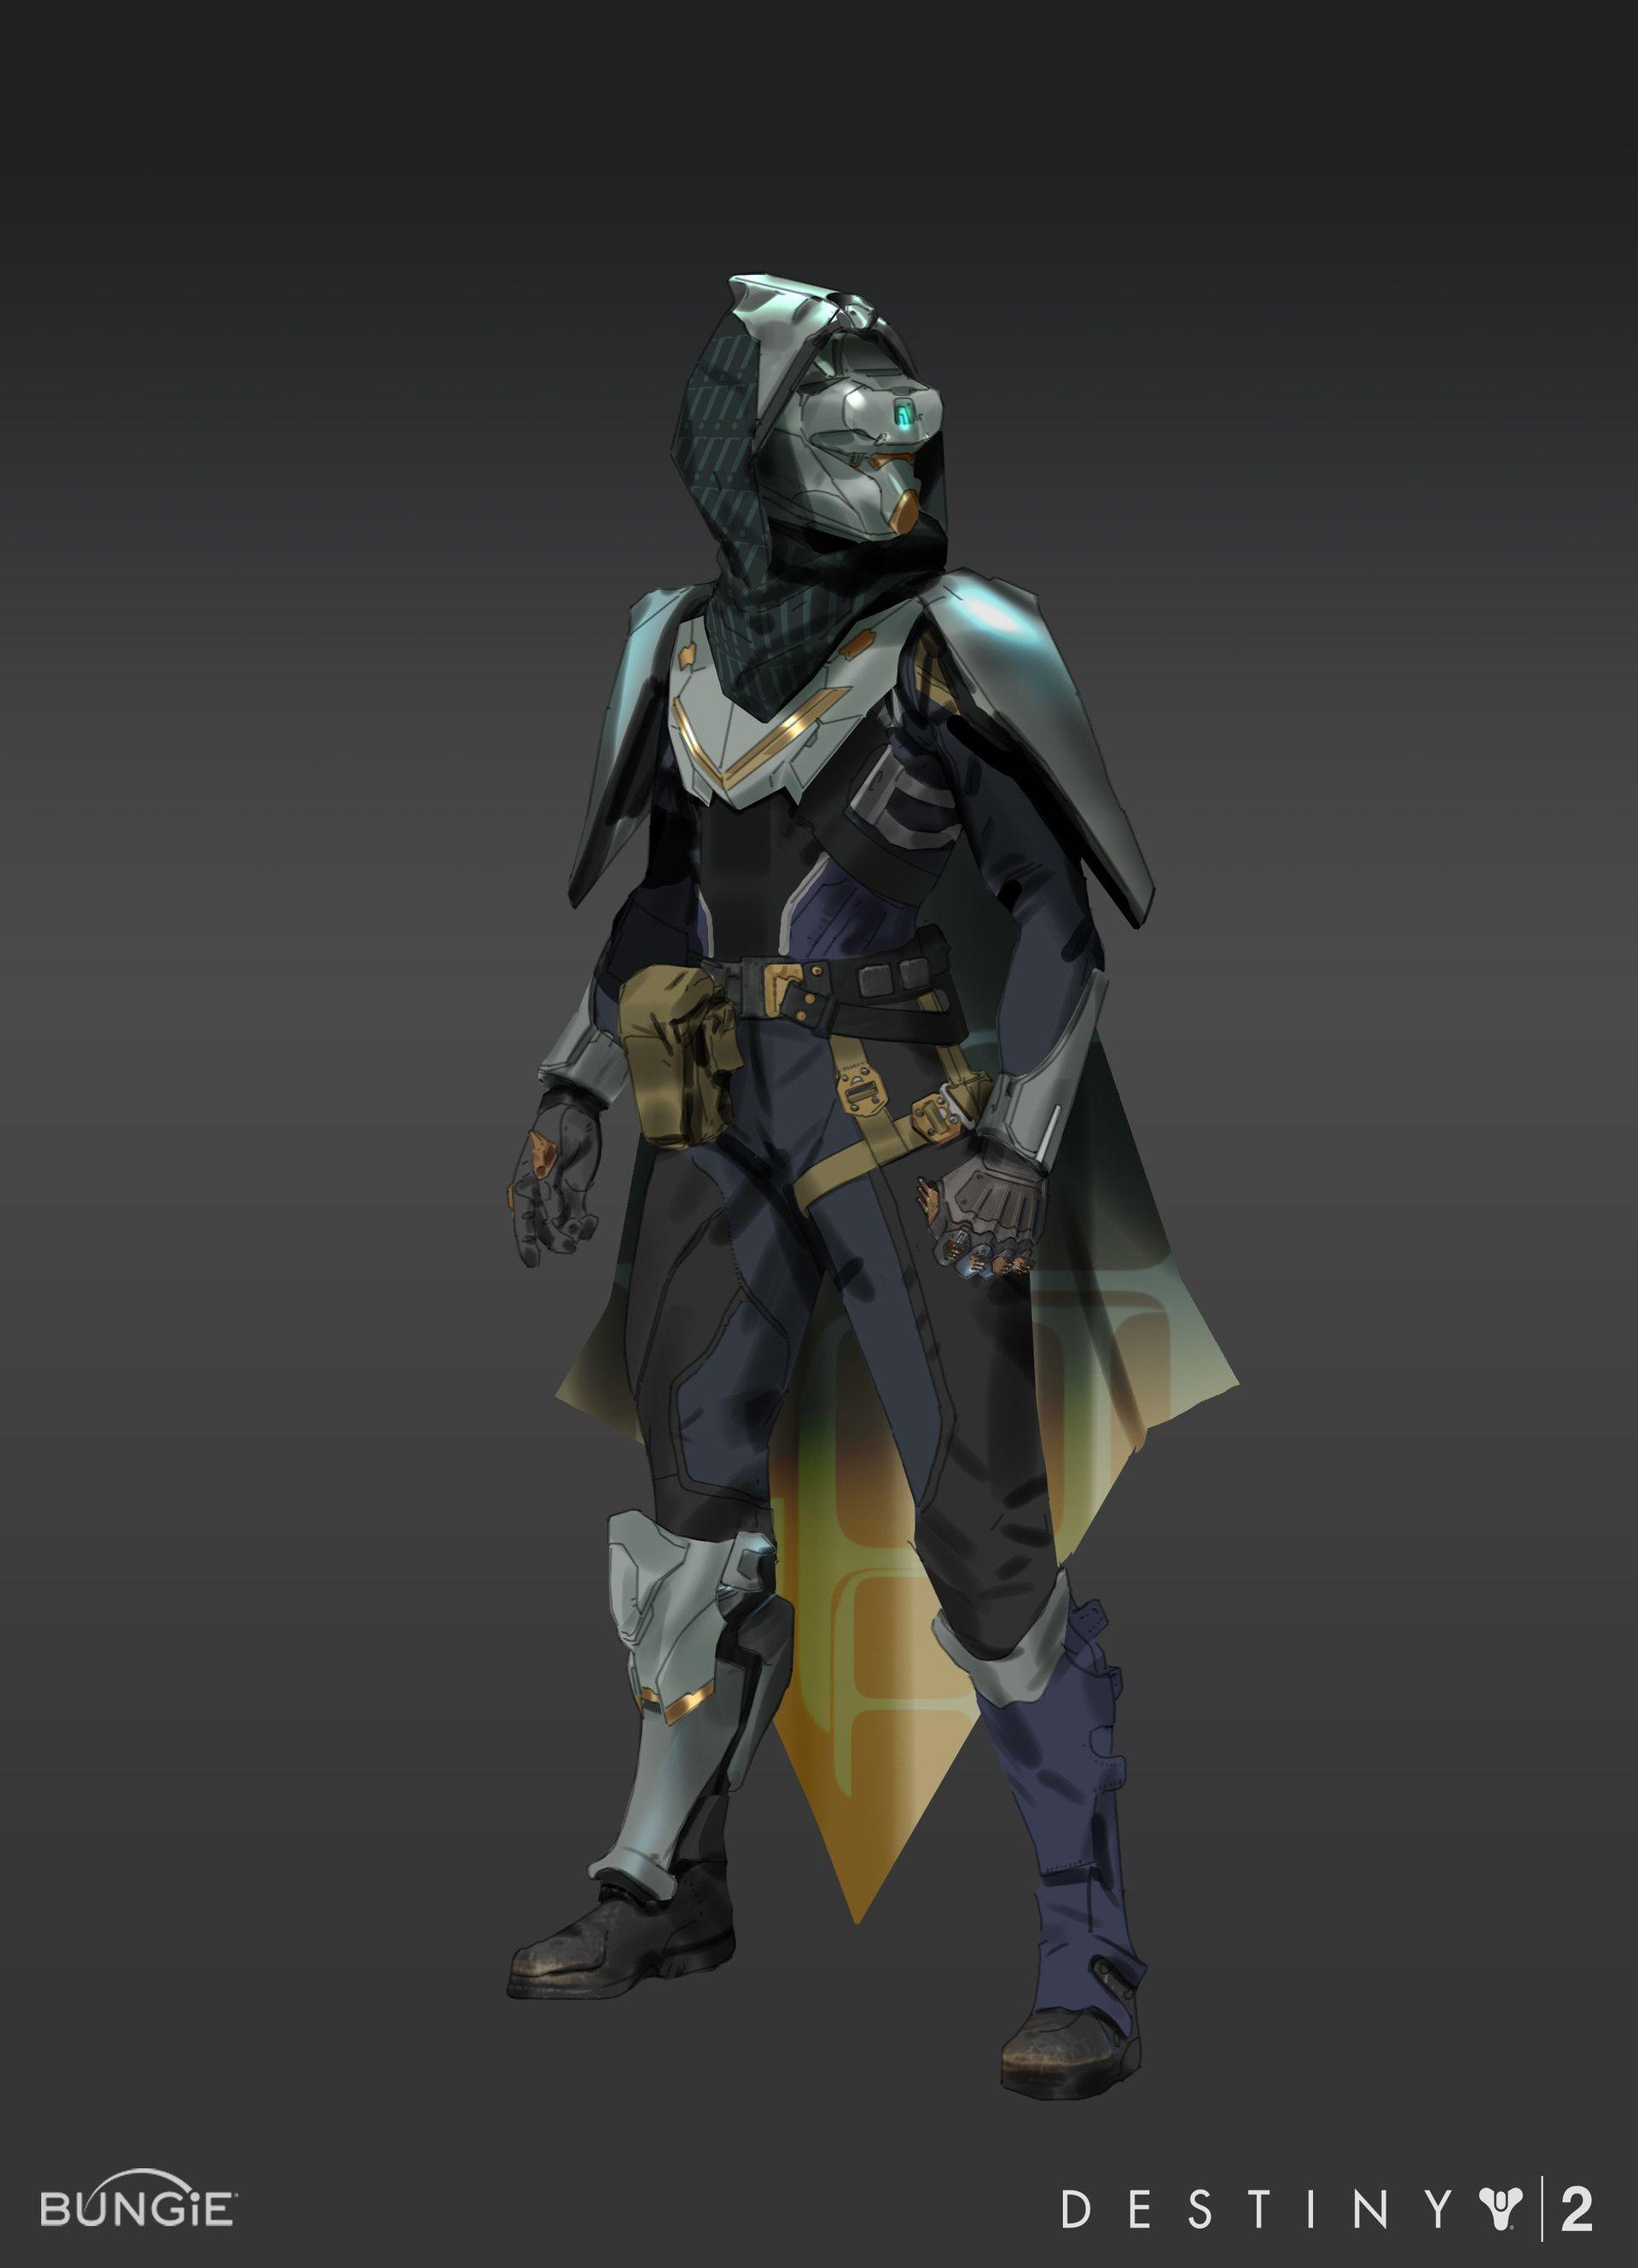 Destiny 2 Titan Armor Sets